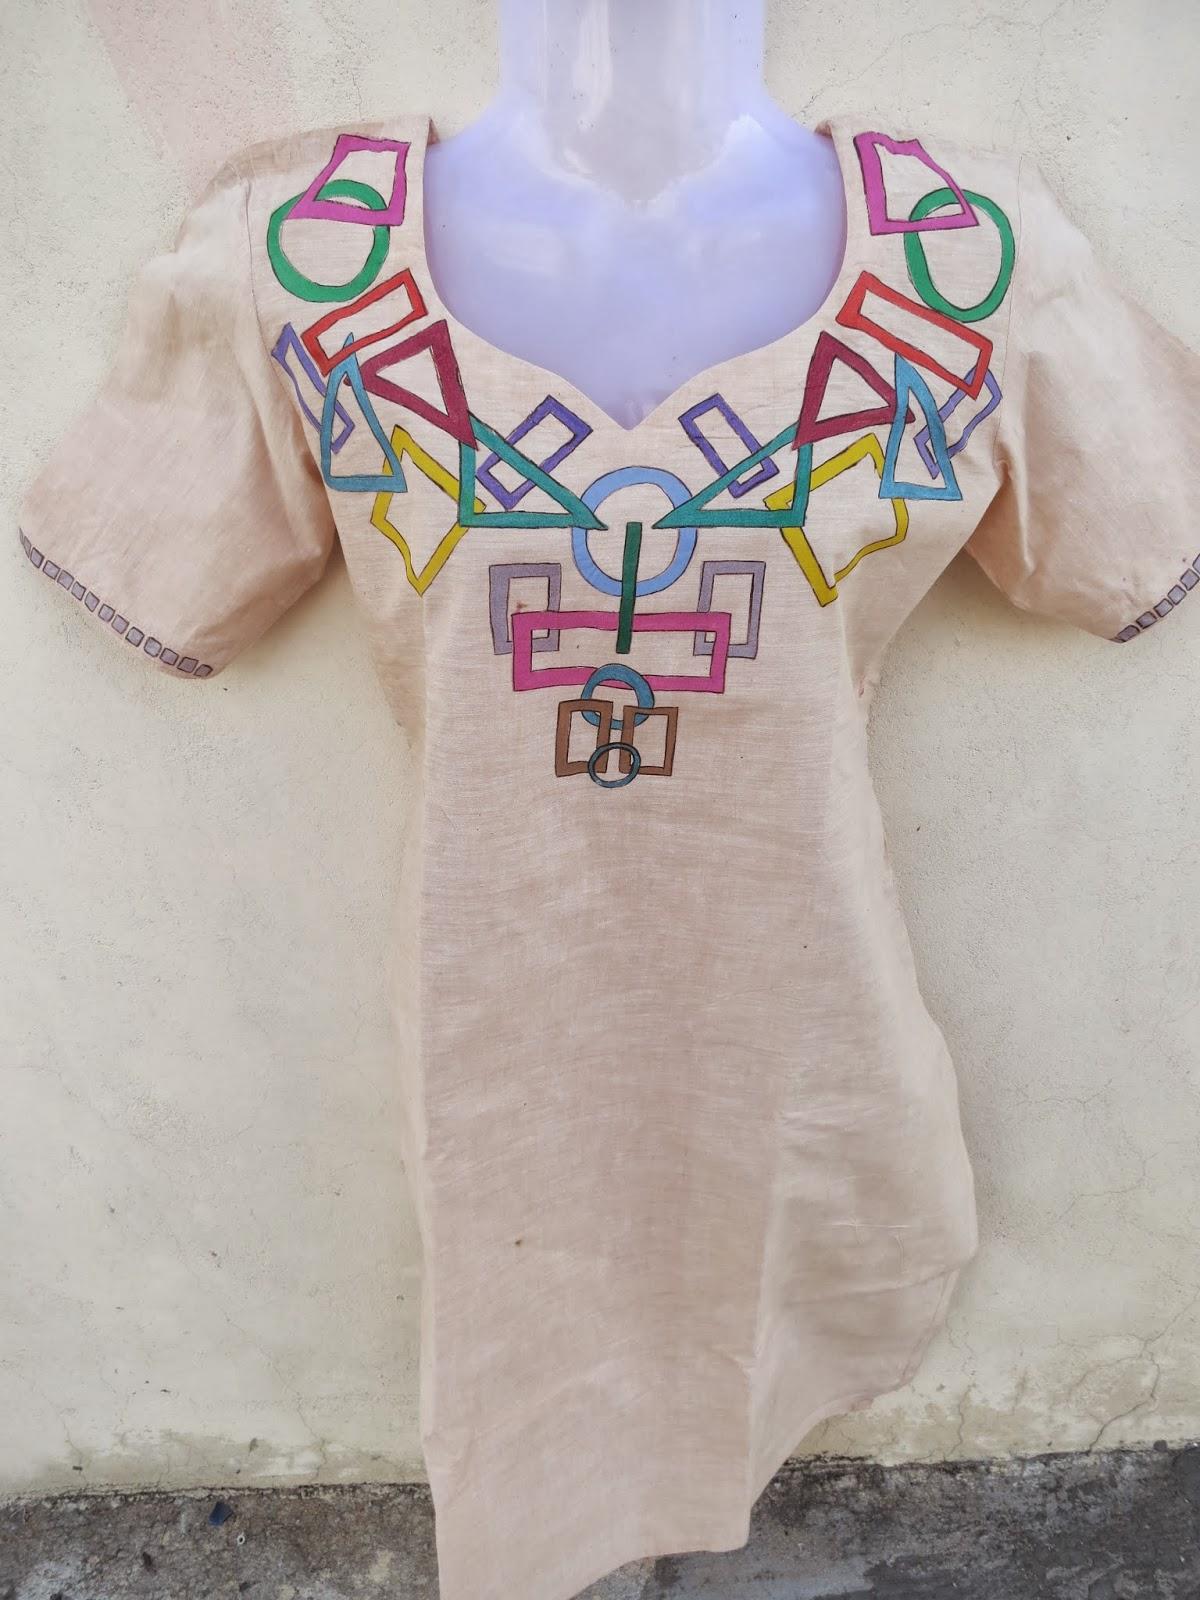 Kurtis: Hand painted kurtis for sale for fabric painting designs on white kurtis  1lp1fsj